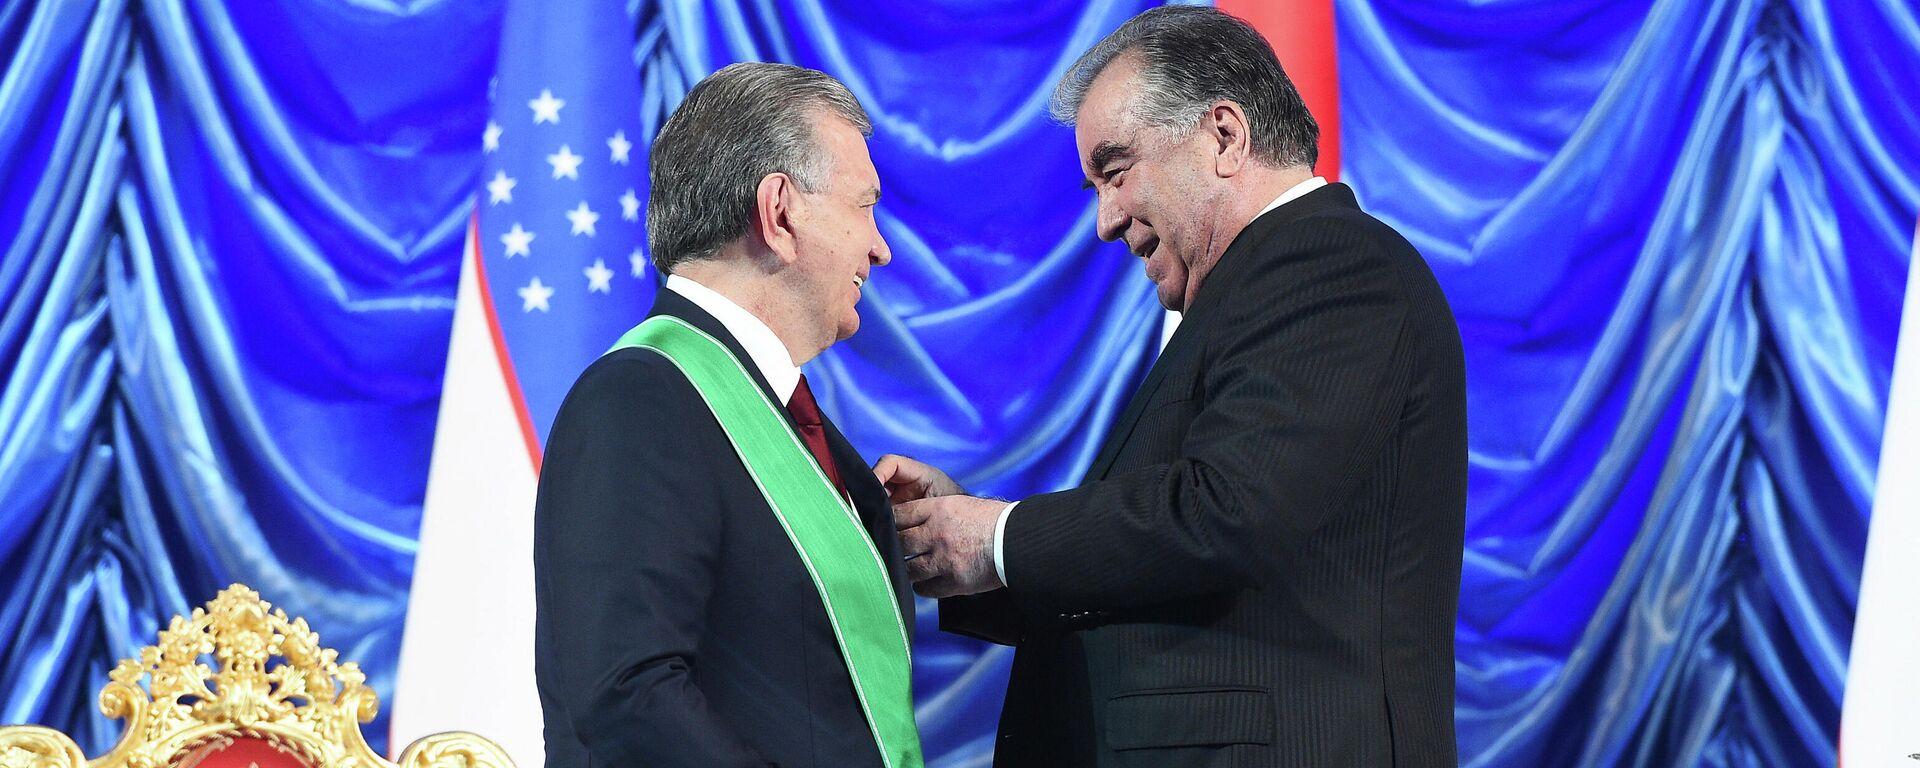 Президент Таджикистана Эмомали Рахмон наградил главу Узбекистана Шавката Мирзиёева почетным орденом - Sputnik Таджикистан, 1920, 10.06.2021